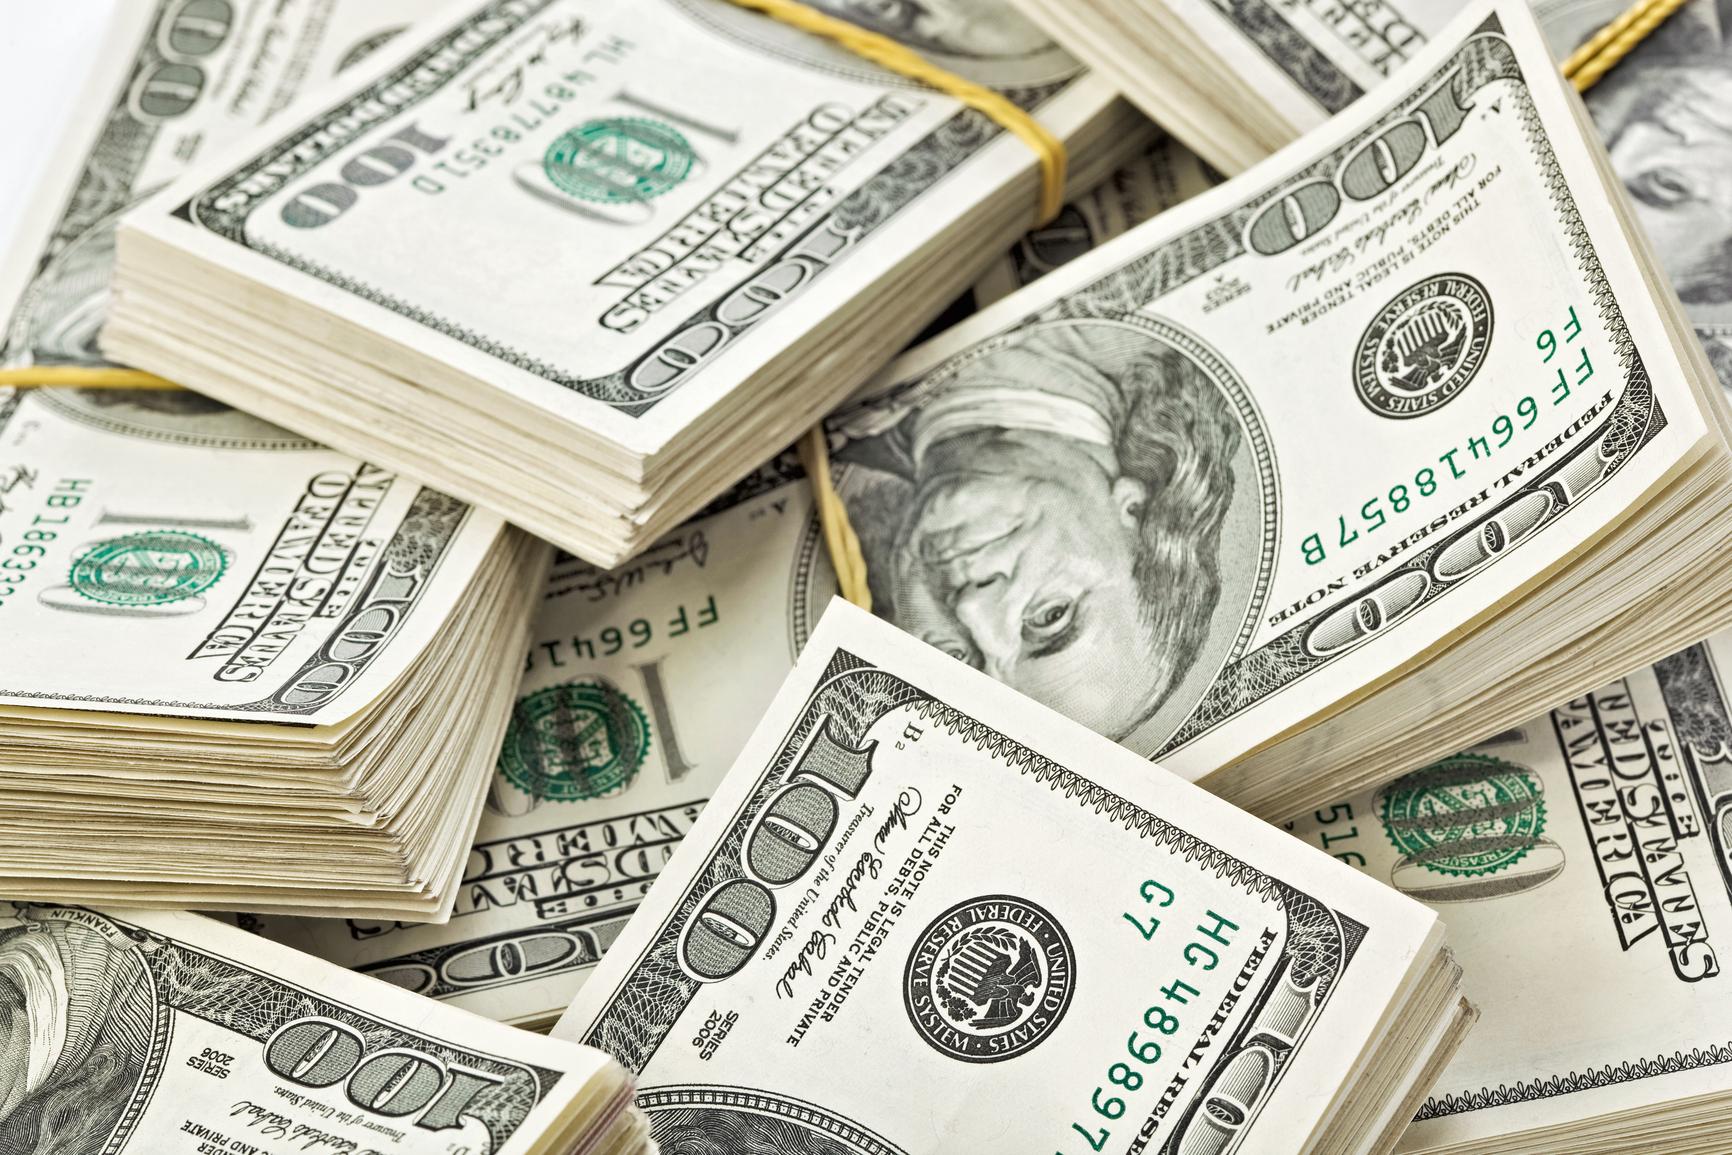 Tanzania Money Images Money